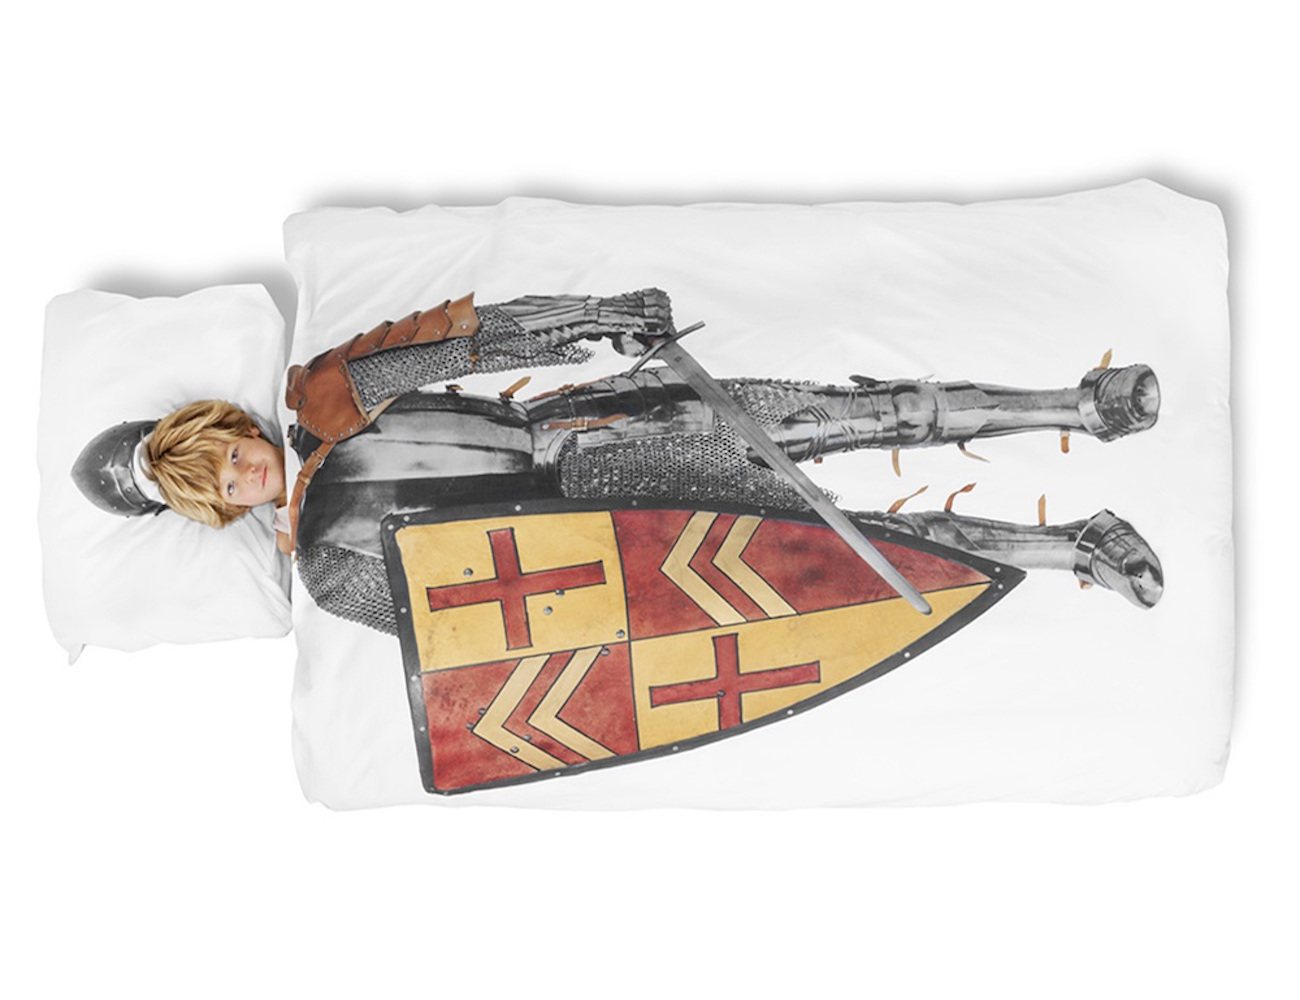 knight-duvet-set-by-snurk-03